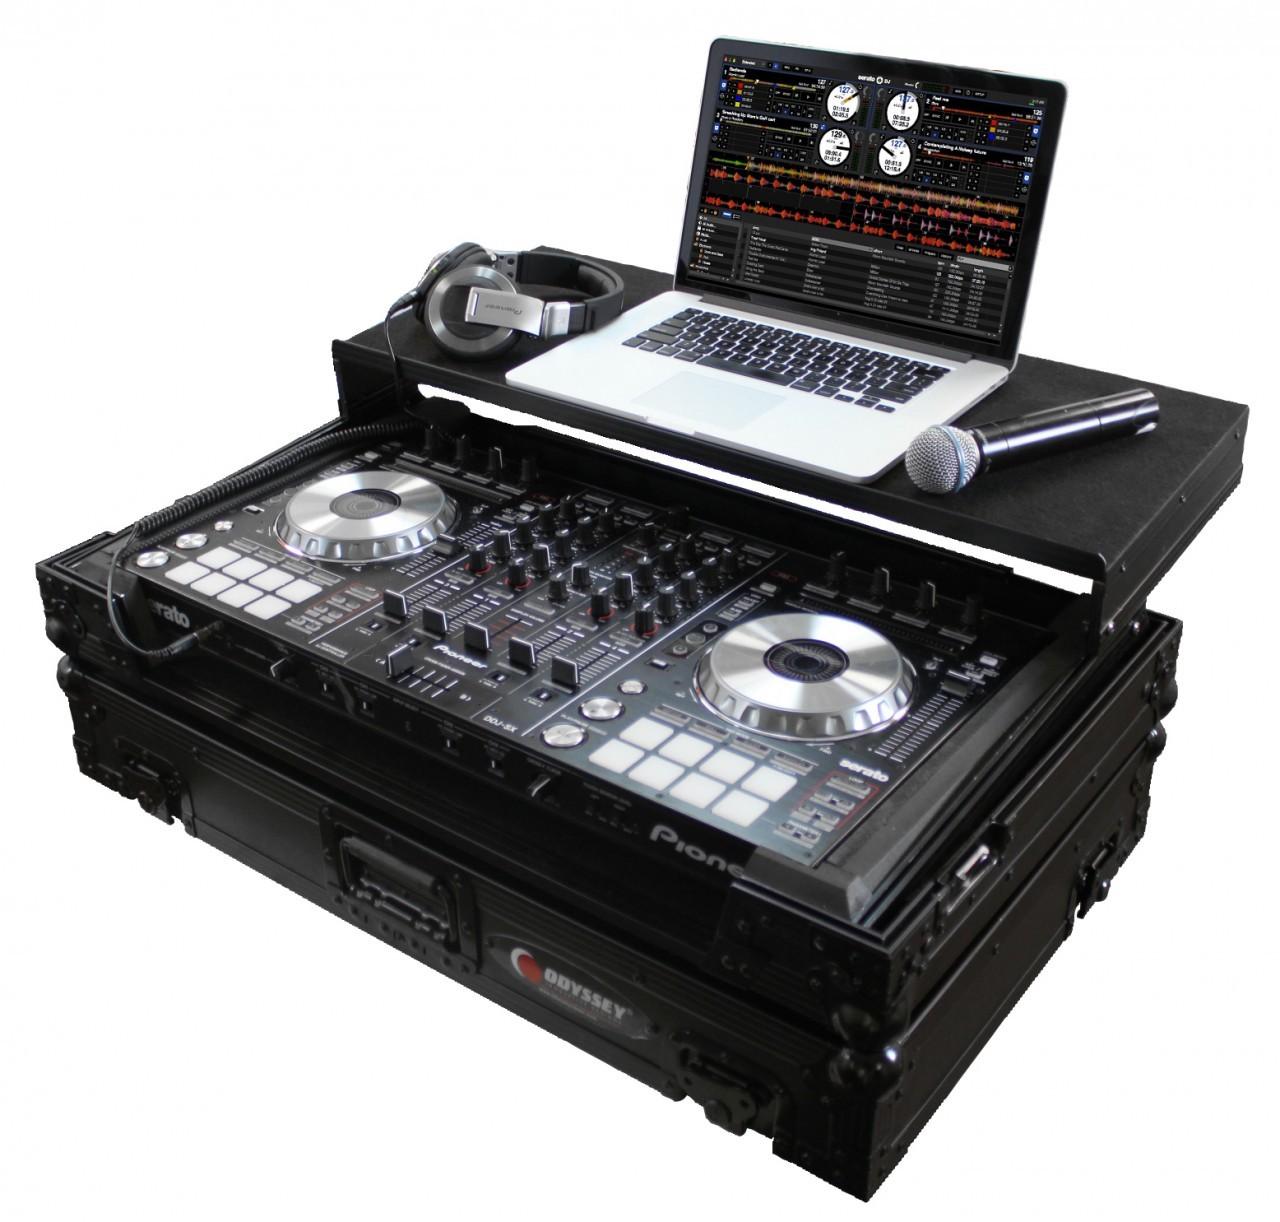 Black Label Glide Style Case for Pioneer DDJ-SX, DDJ-S1, or DDJ-T1 Controller